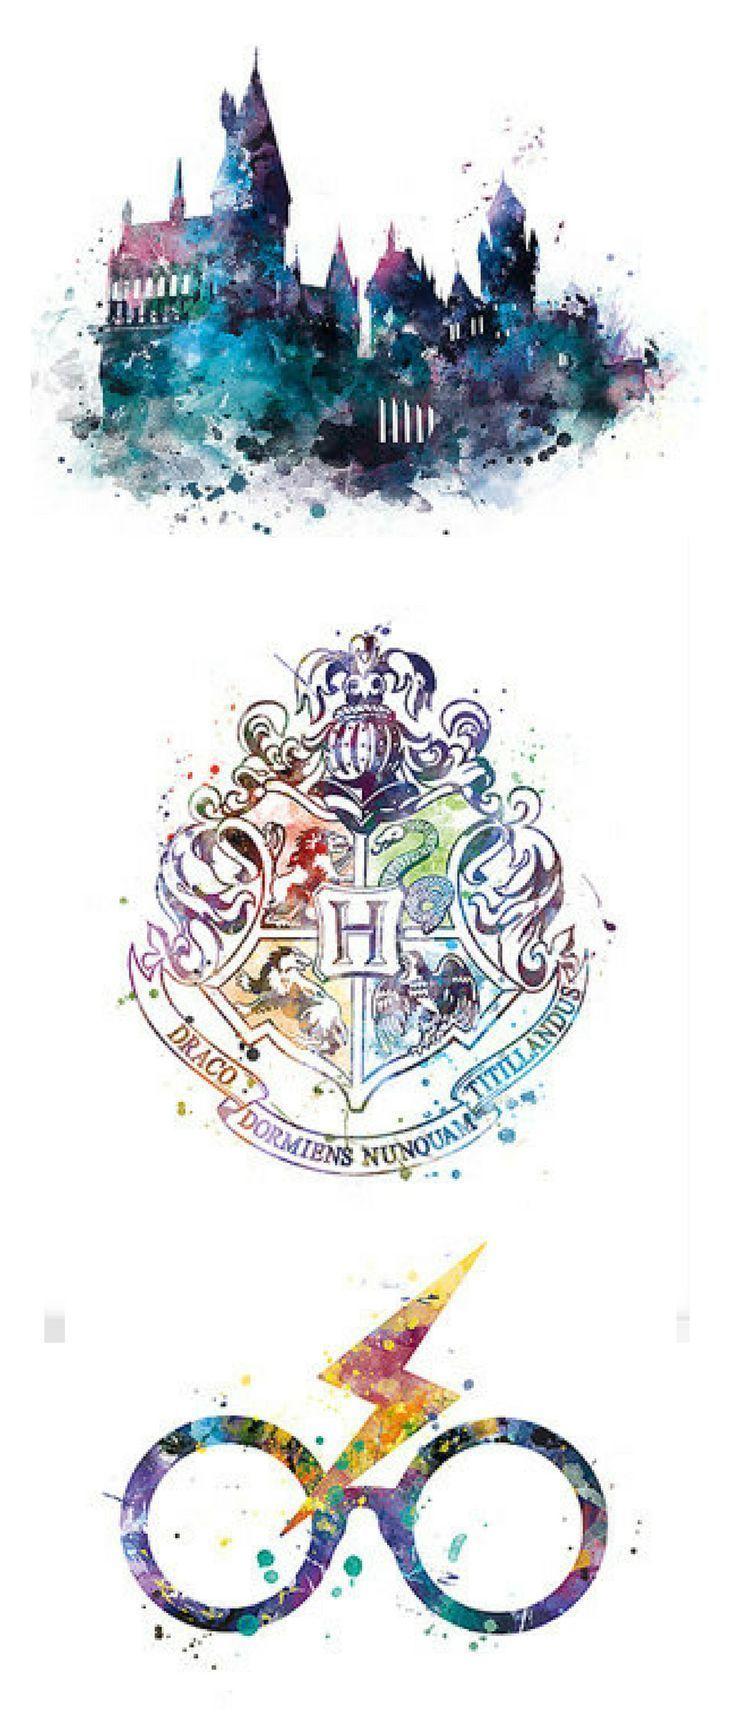 Harry Potter Printable Wall Art – #printable #Harry #headpiece #Potter #Wall Art